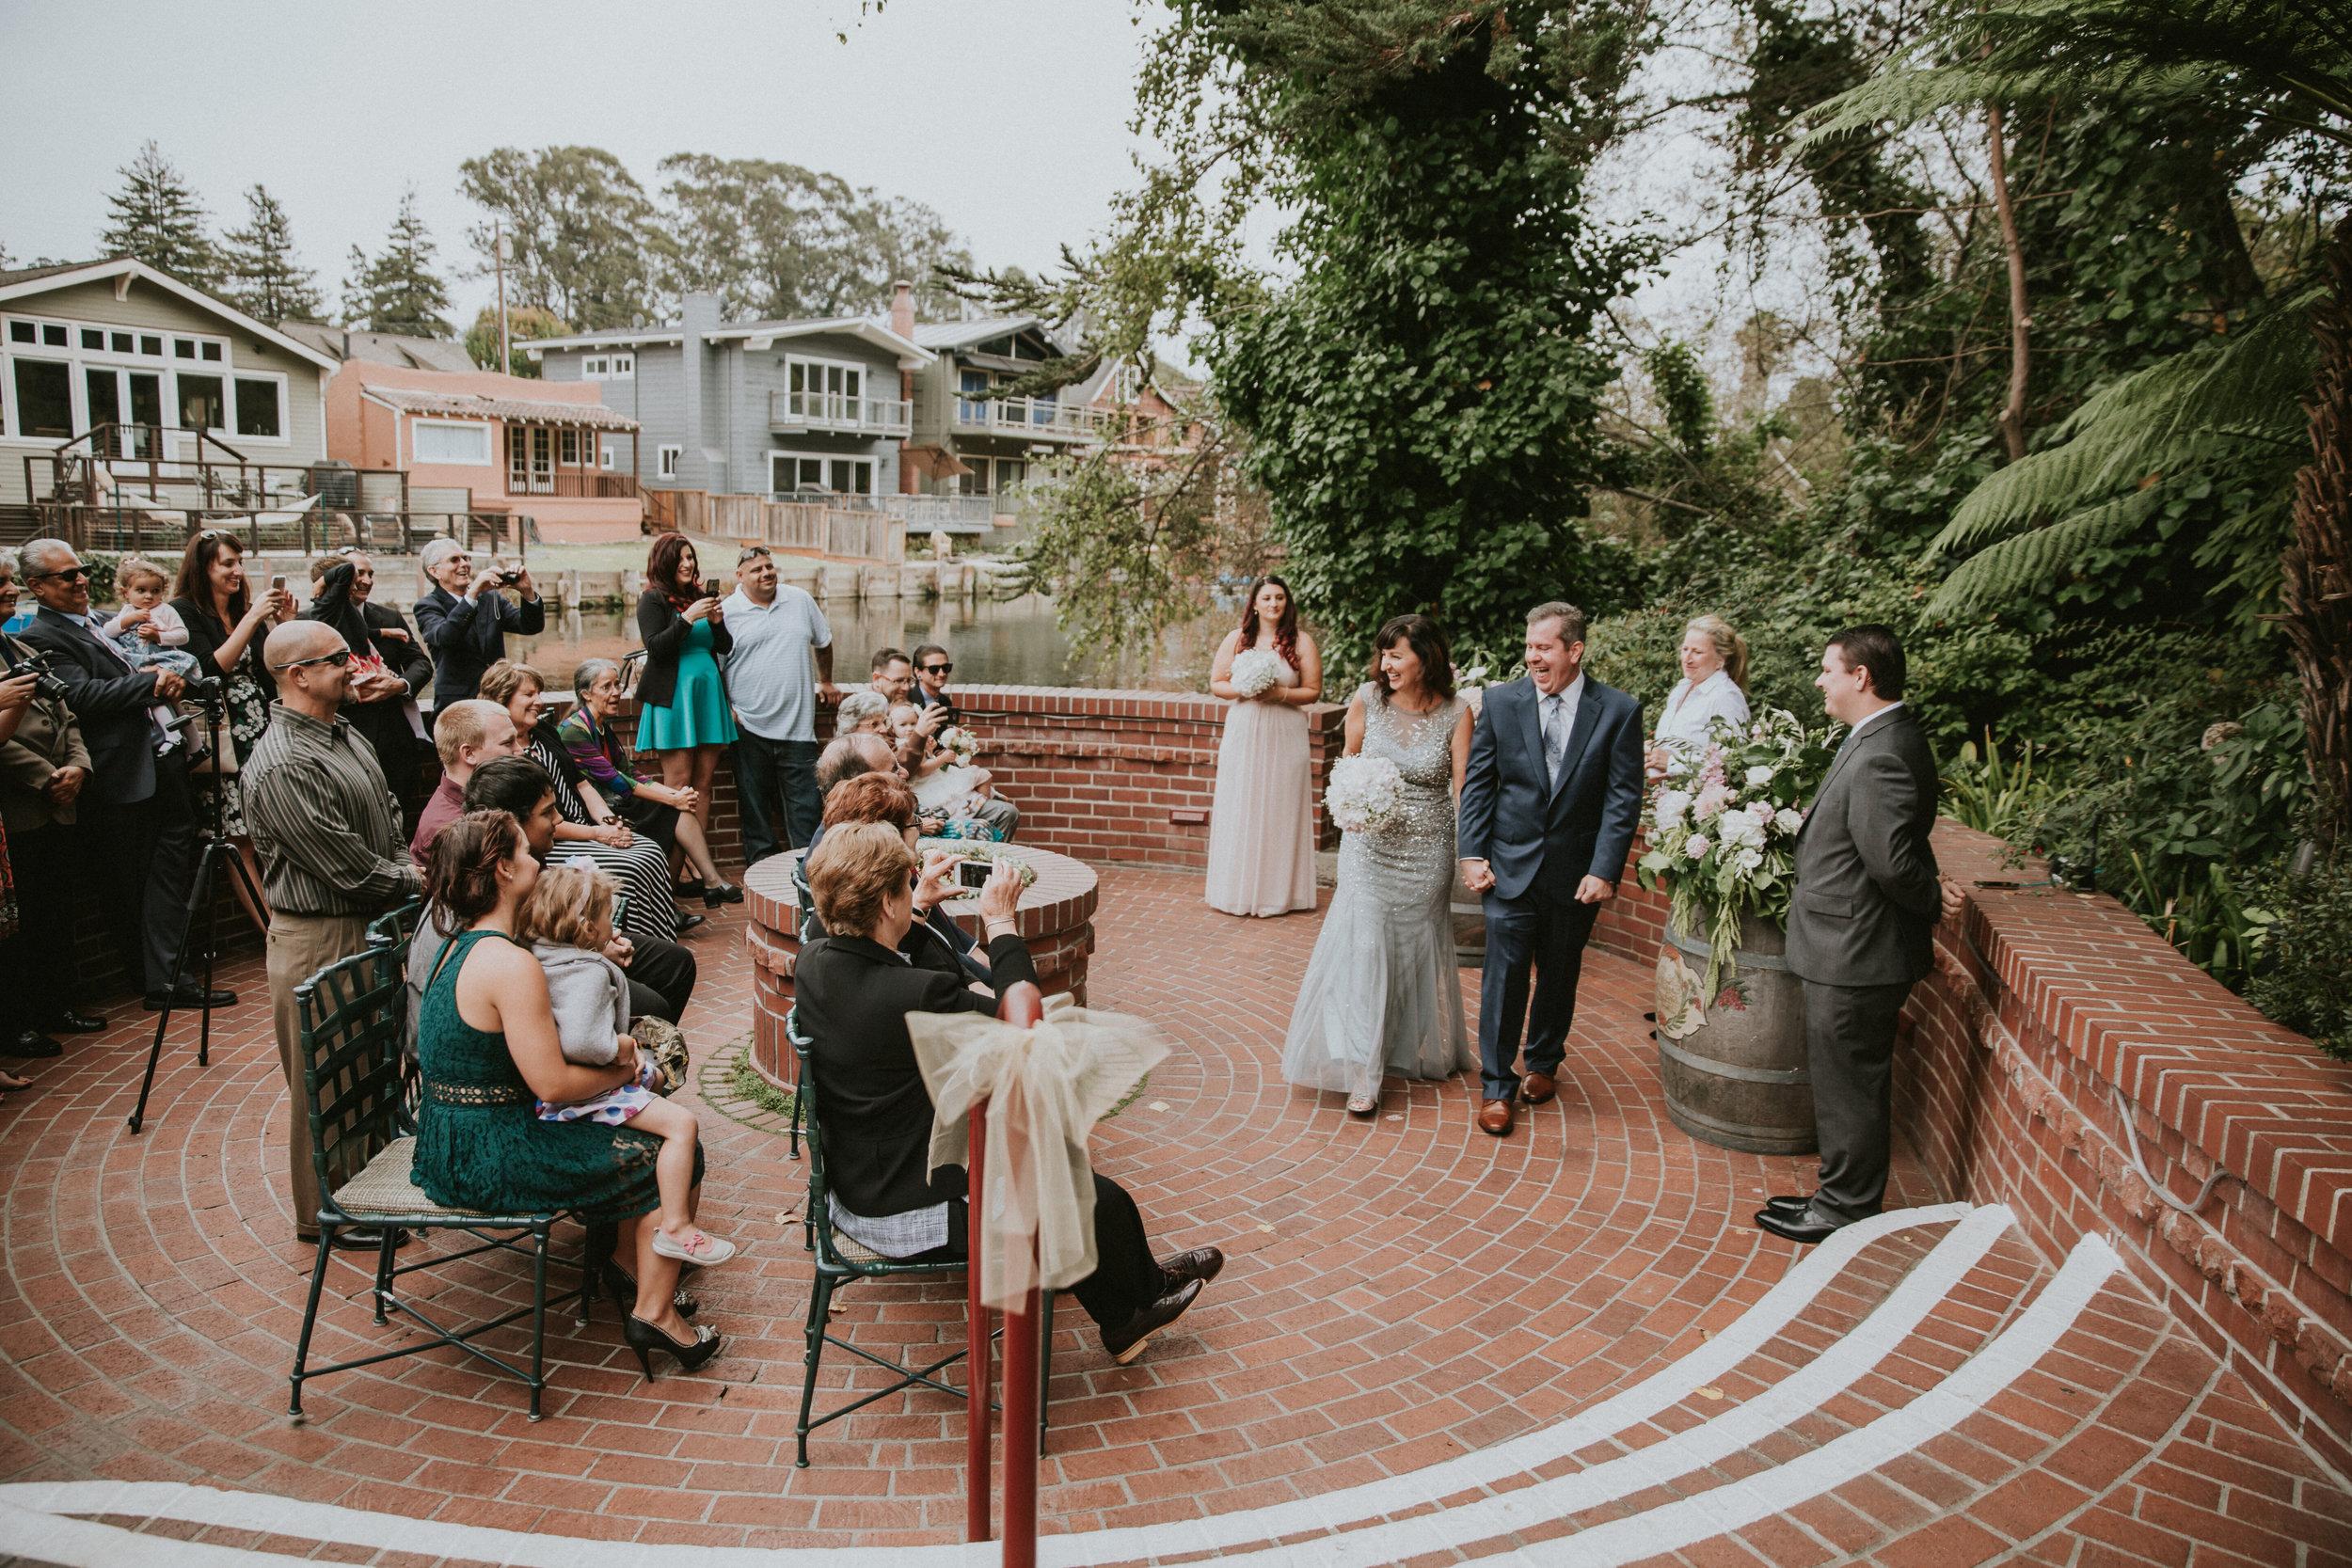 Capitola-Santa-Cruz-wedding-photographer-219.jpg